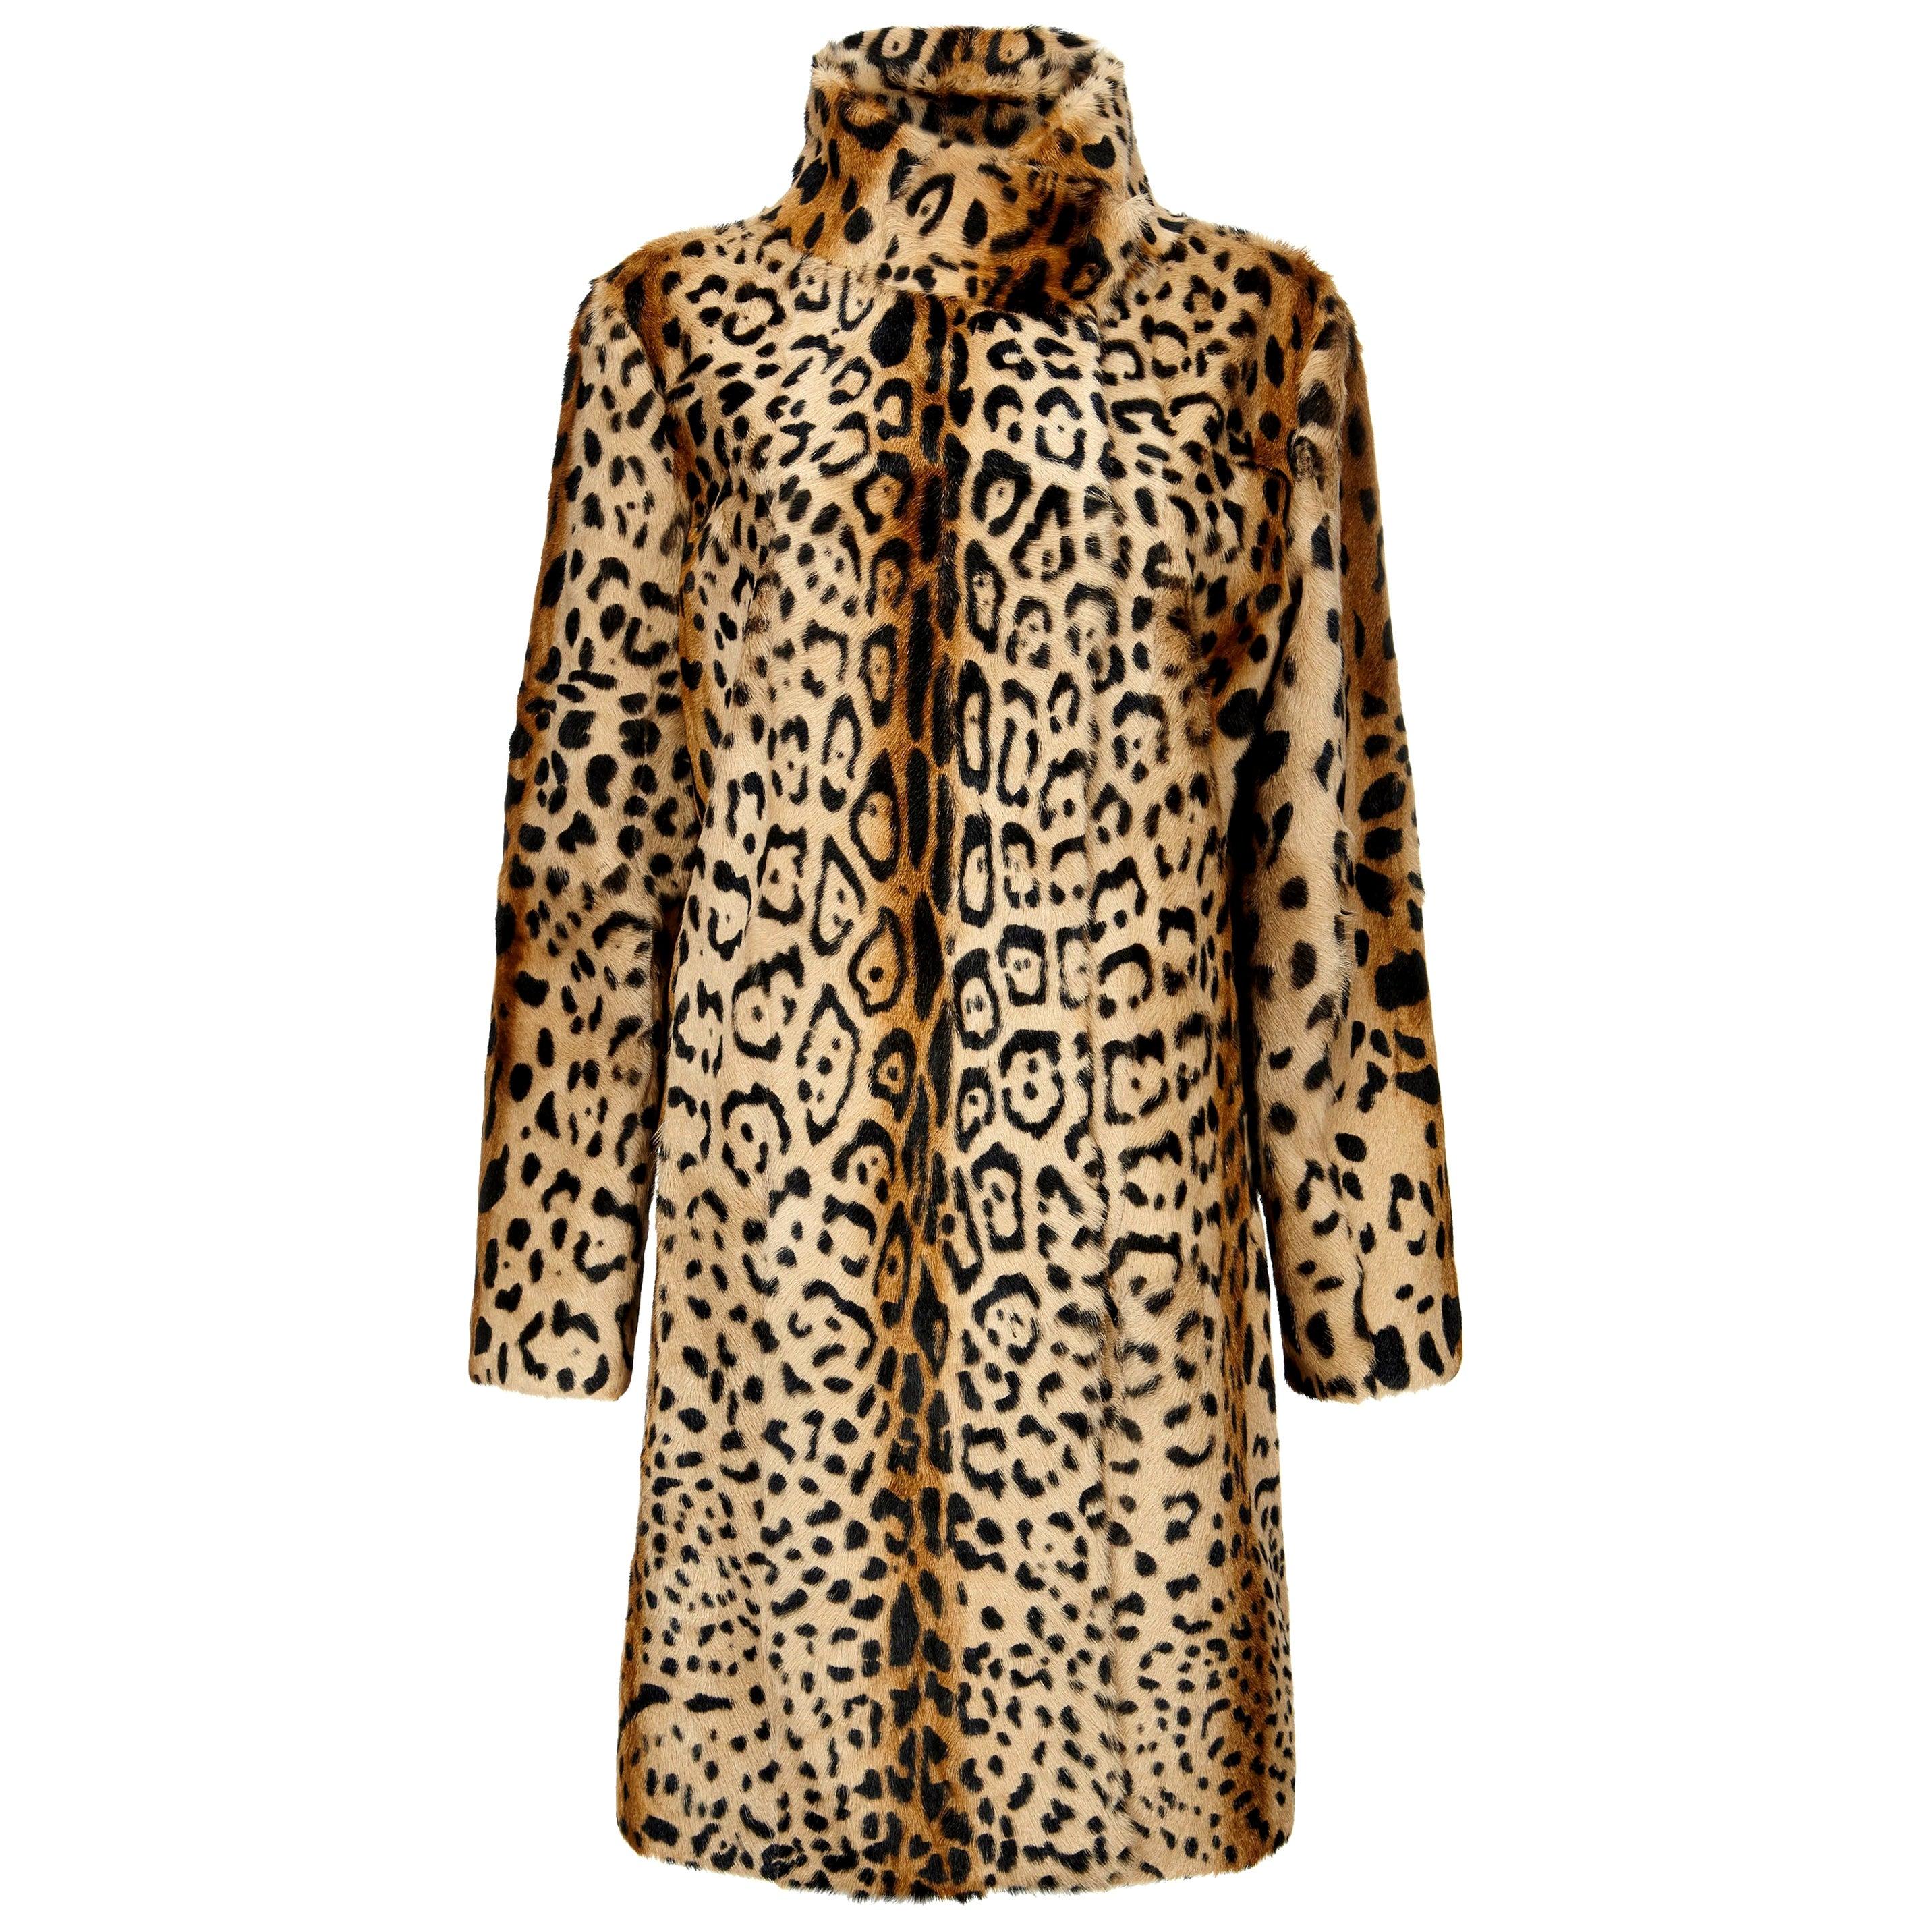 Verheyen London High Collar Leopard Print Coat Natural Goat Hair Fur Size uk 14